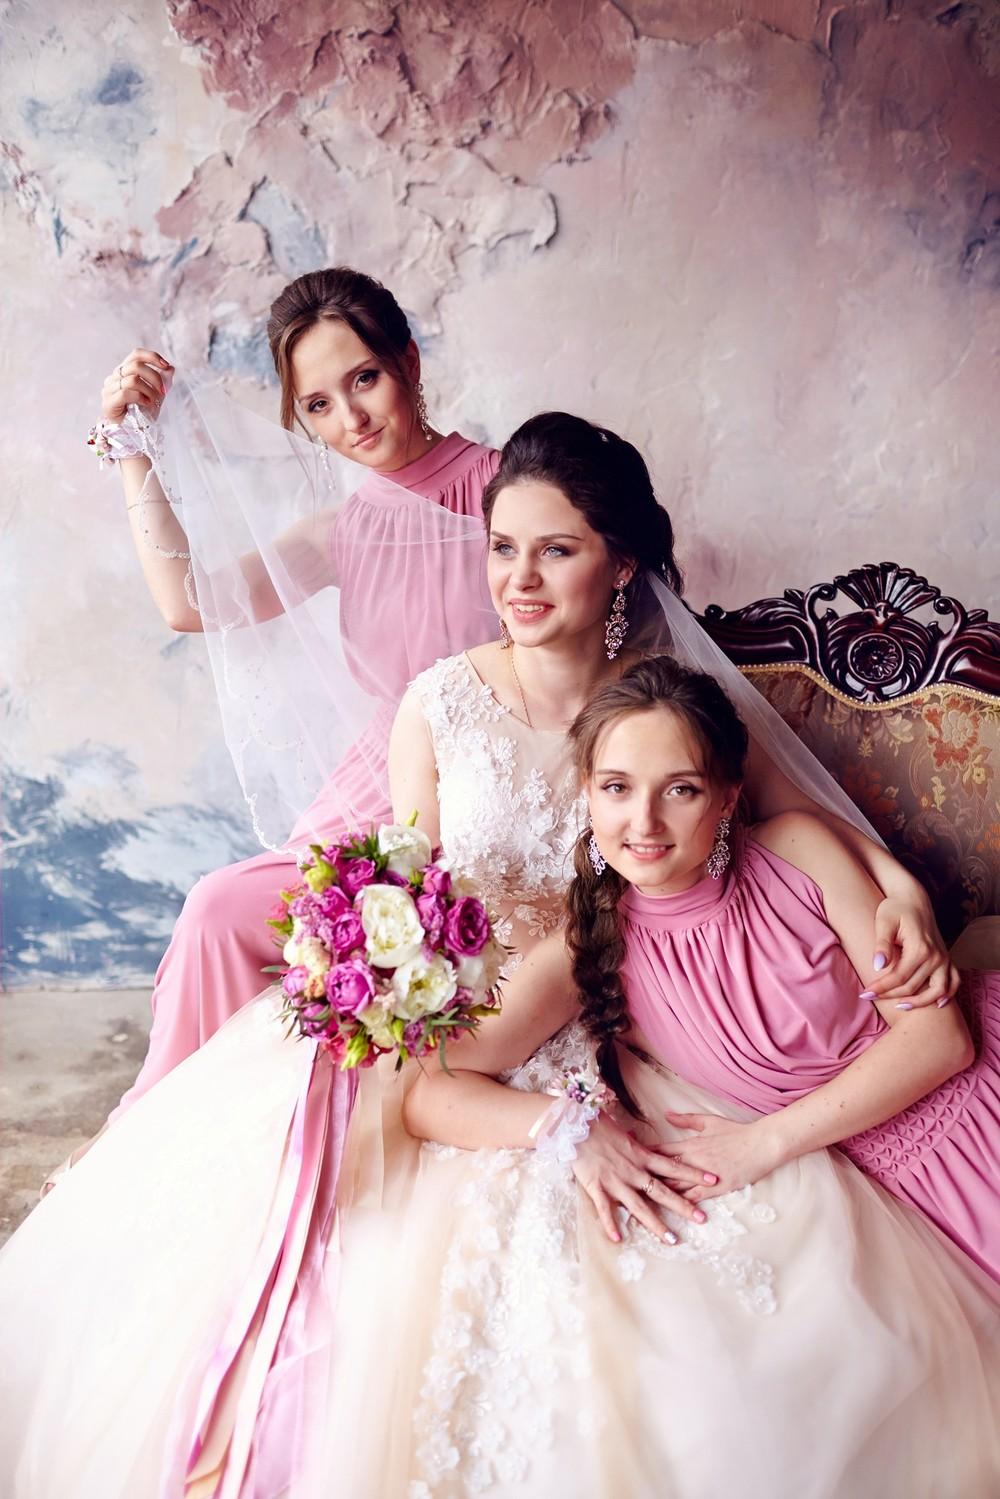 Ирина и Саша